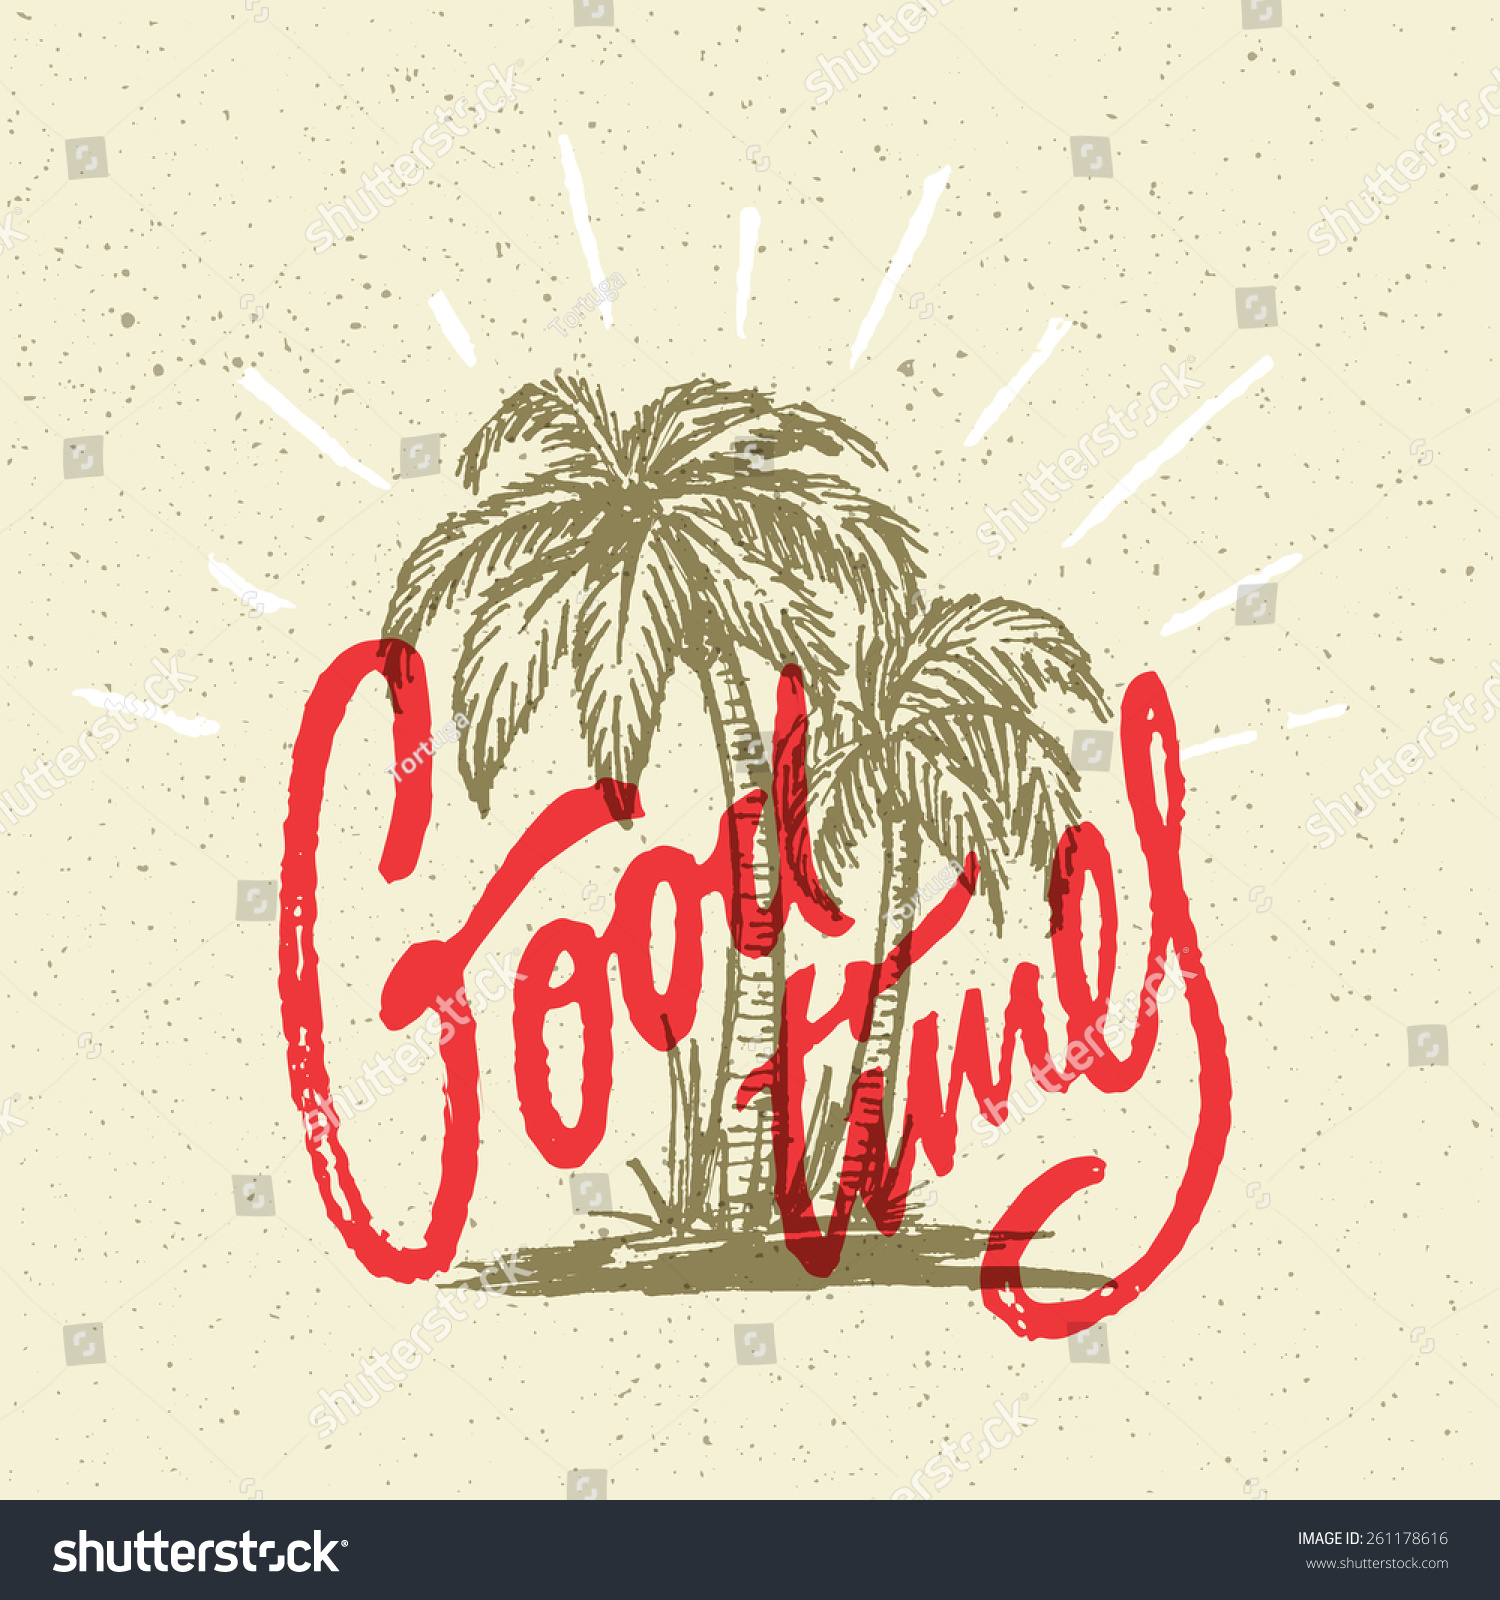 T-shirt design handmade - Good Times Summer Positive Hand Crafted Vintage Original T Shirt Graphic Design Handmade Retro Styled